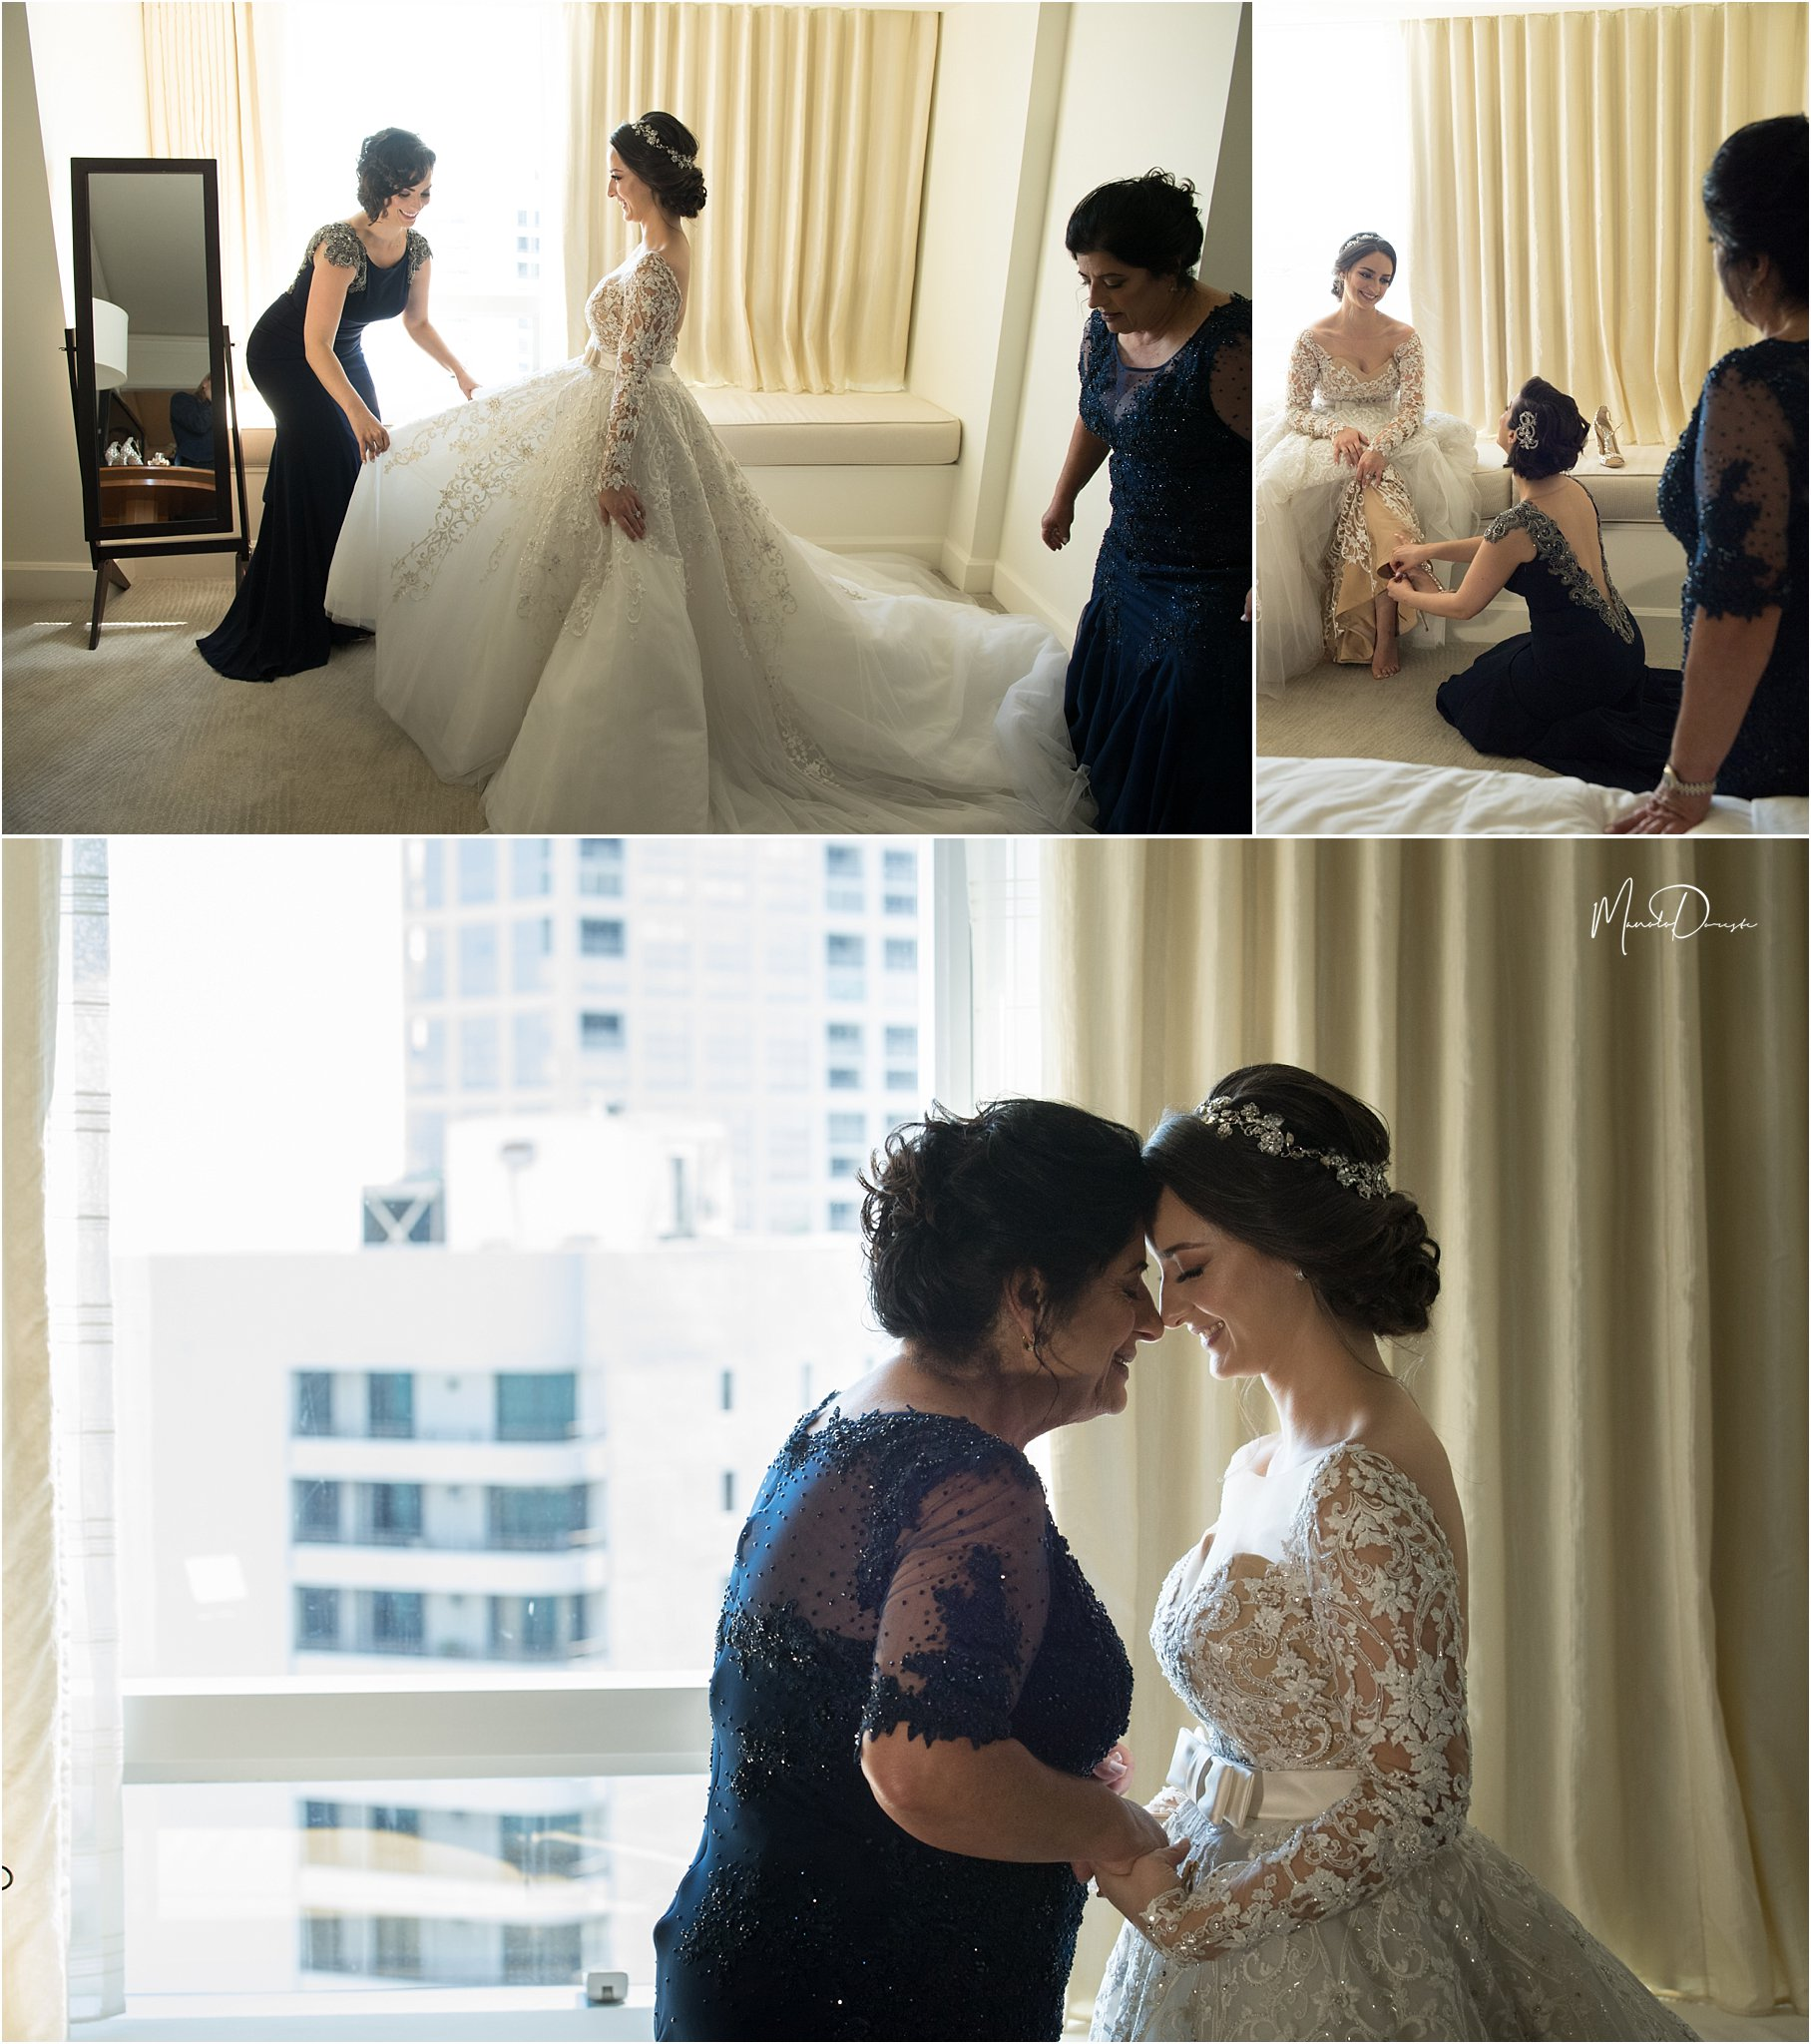 00711_ManoloDoreste_InFocusStudios_Wedding_Family_Photography_Miami_MiamiPhotographer.jpg